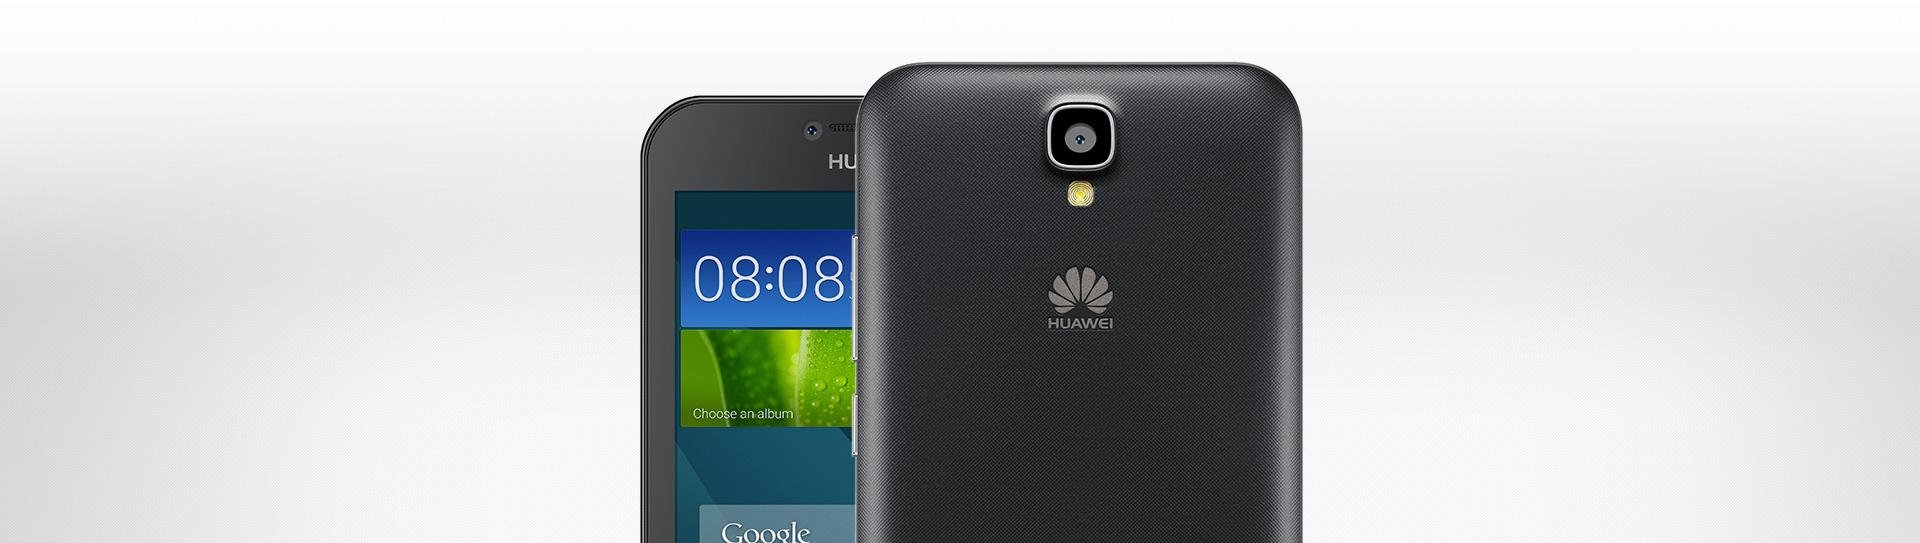 Huawei Y5 Dual Sim Black Price In Pakistan Home Shopping